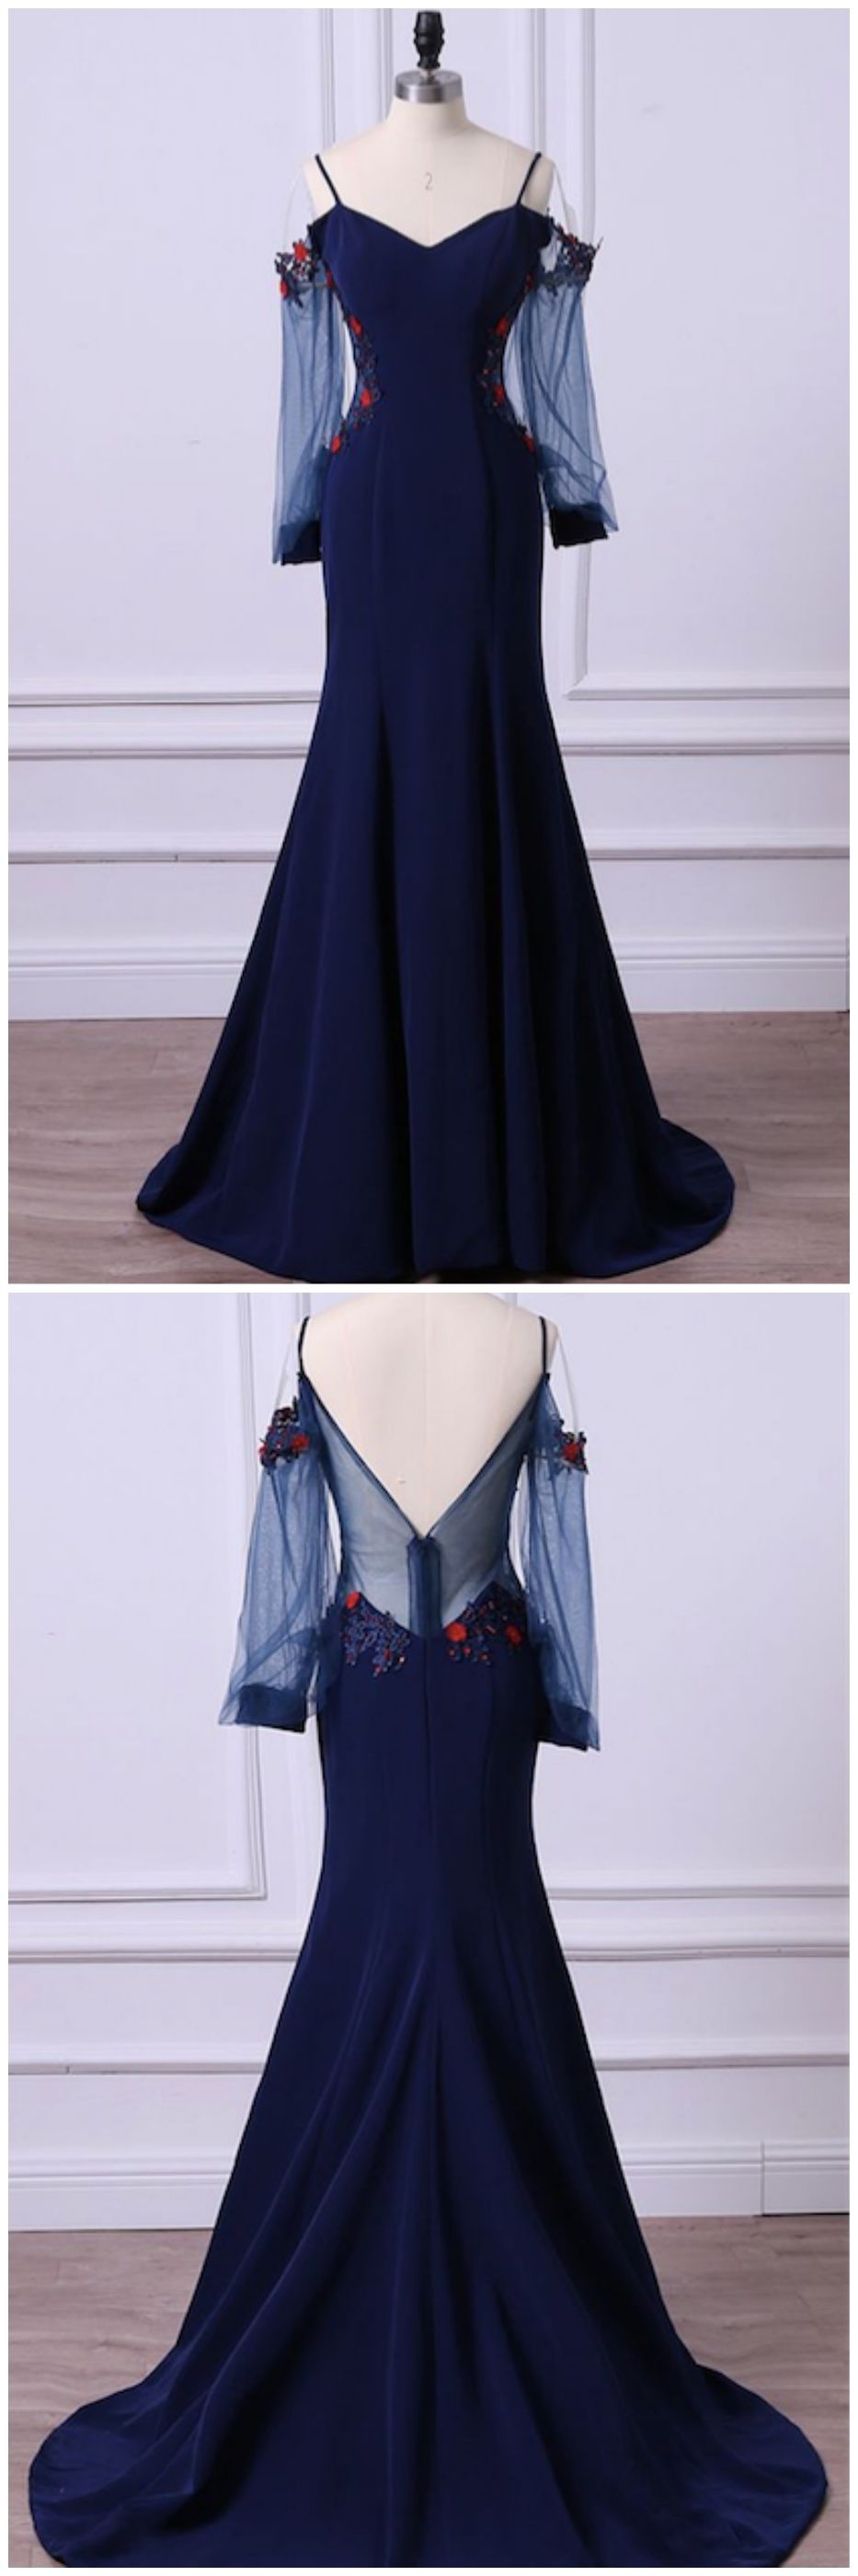 Navy blue mermaid long satin prom dresses with long sleeves ed